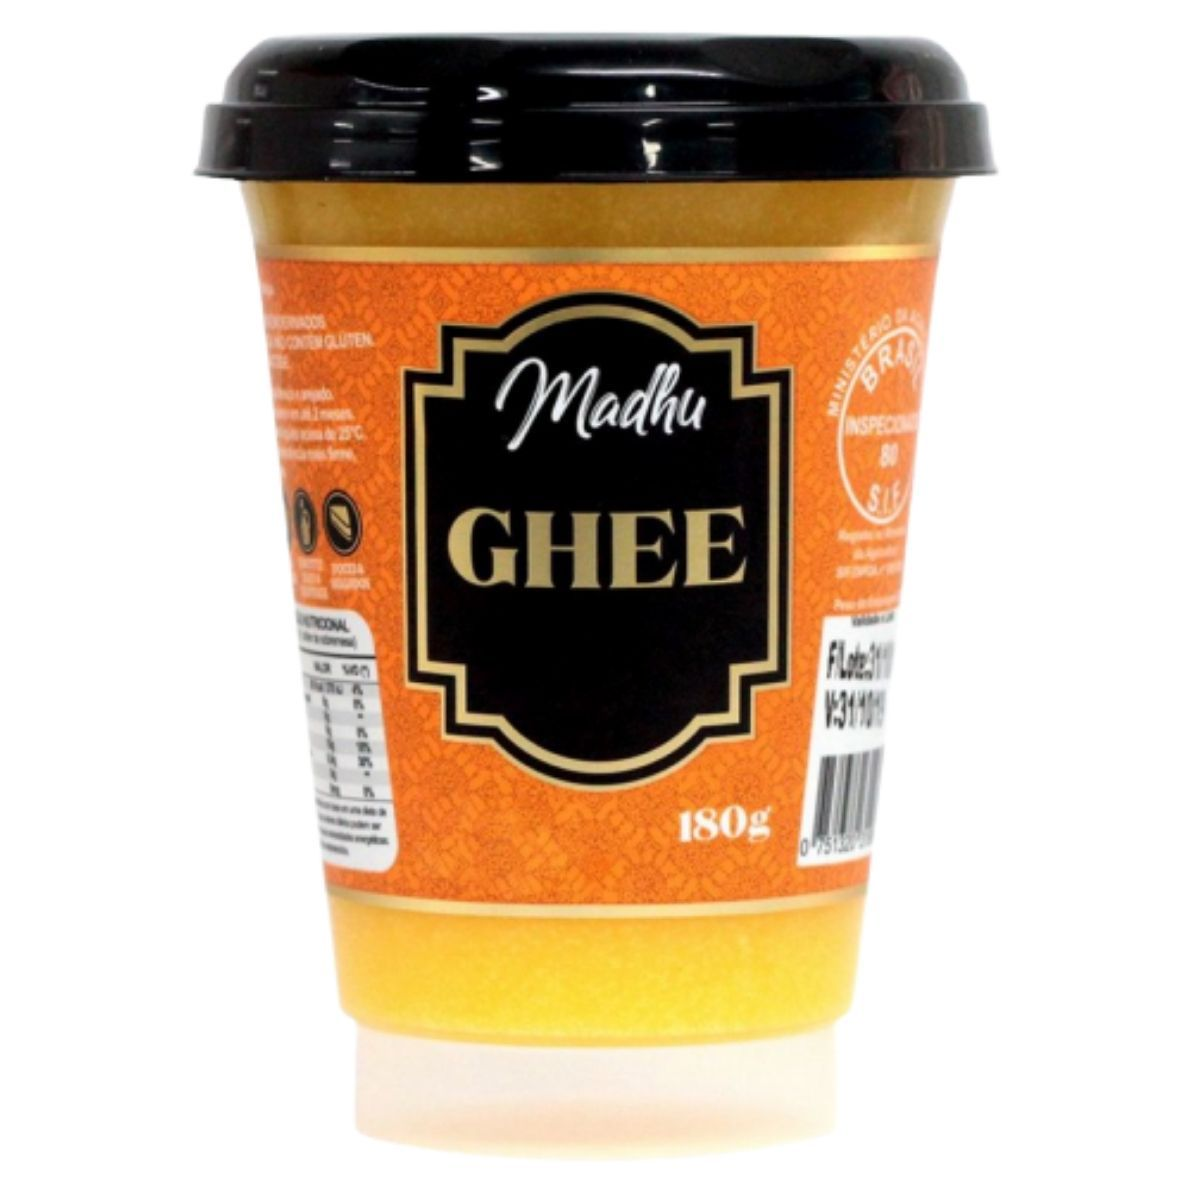 Manteiga Ghee Tradicional Clarificada 180g - Madhu Bakery